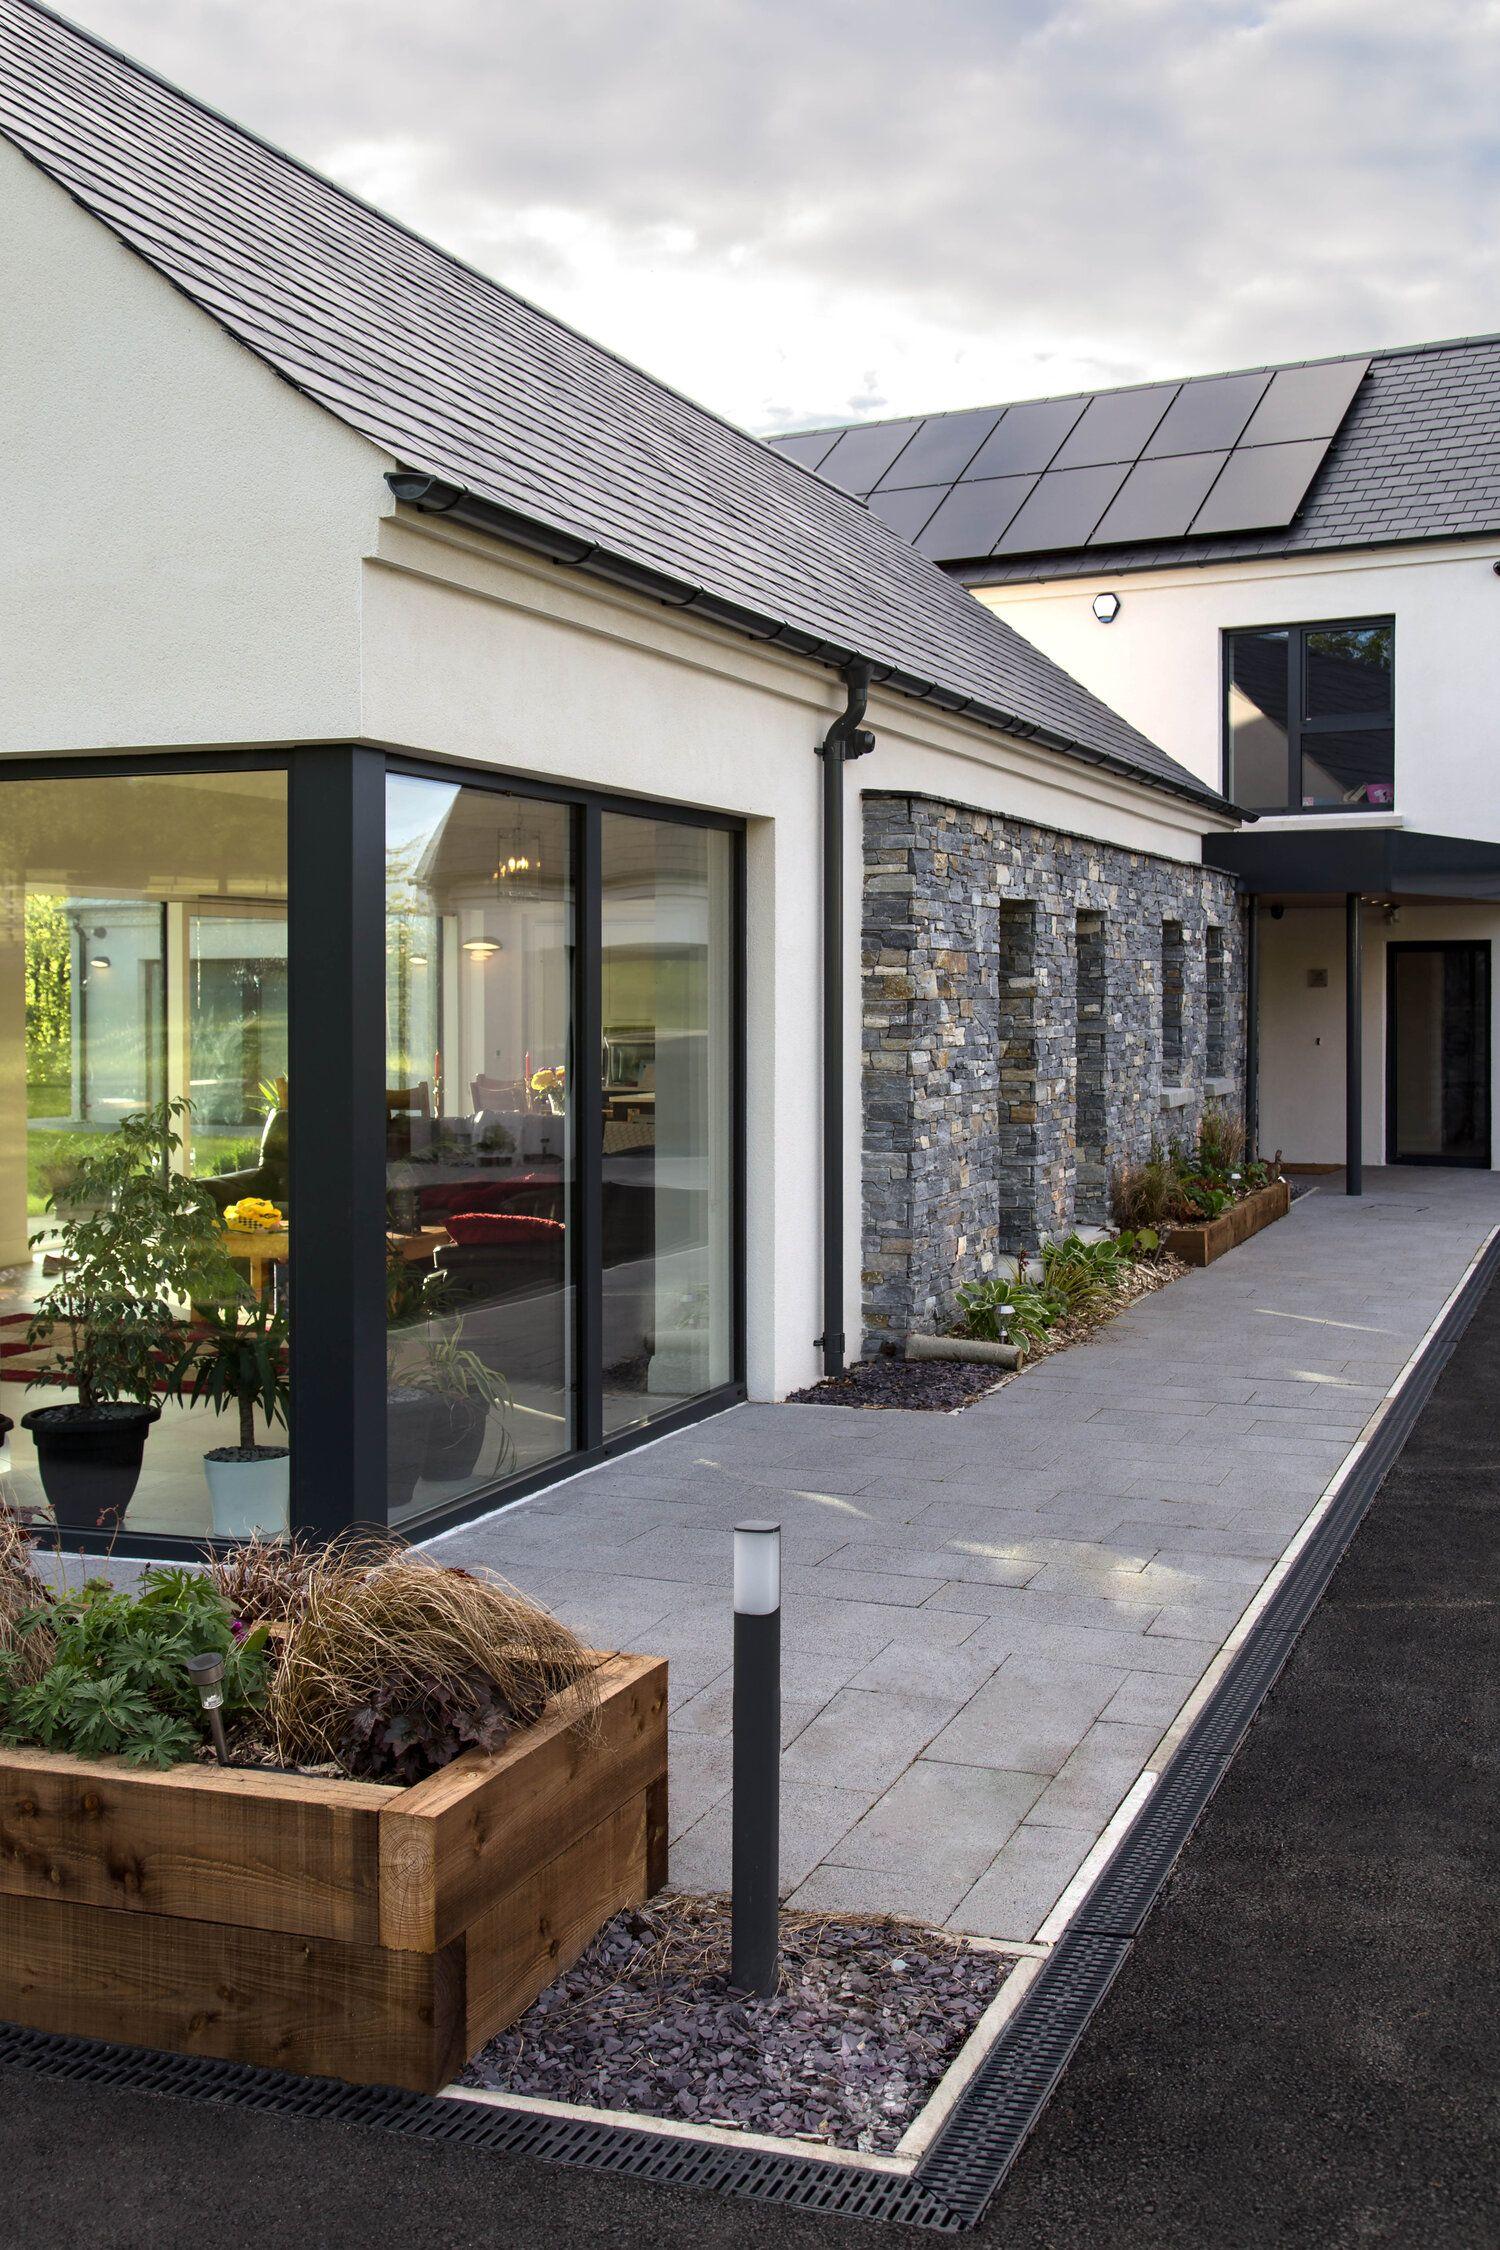 Summerisland Passive House Co Armagh Paul Mcalister Architects House Designs Ireland House Designs Exterior Bungalow Exterior